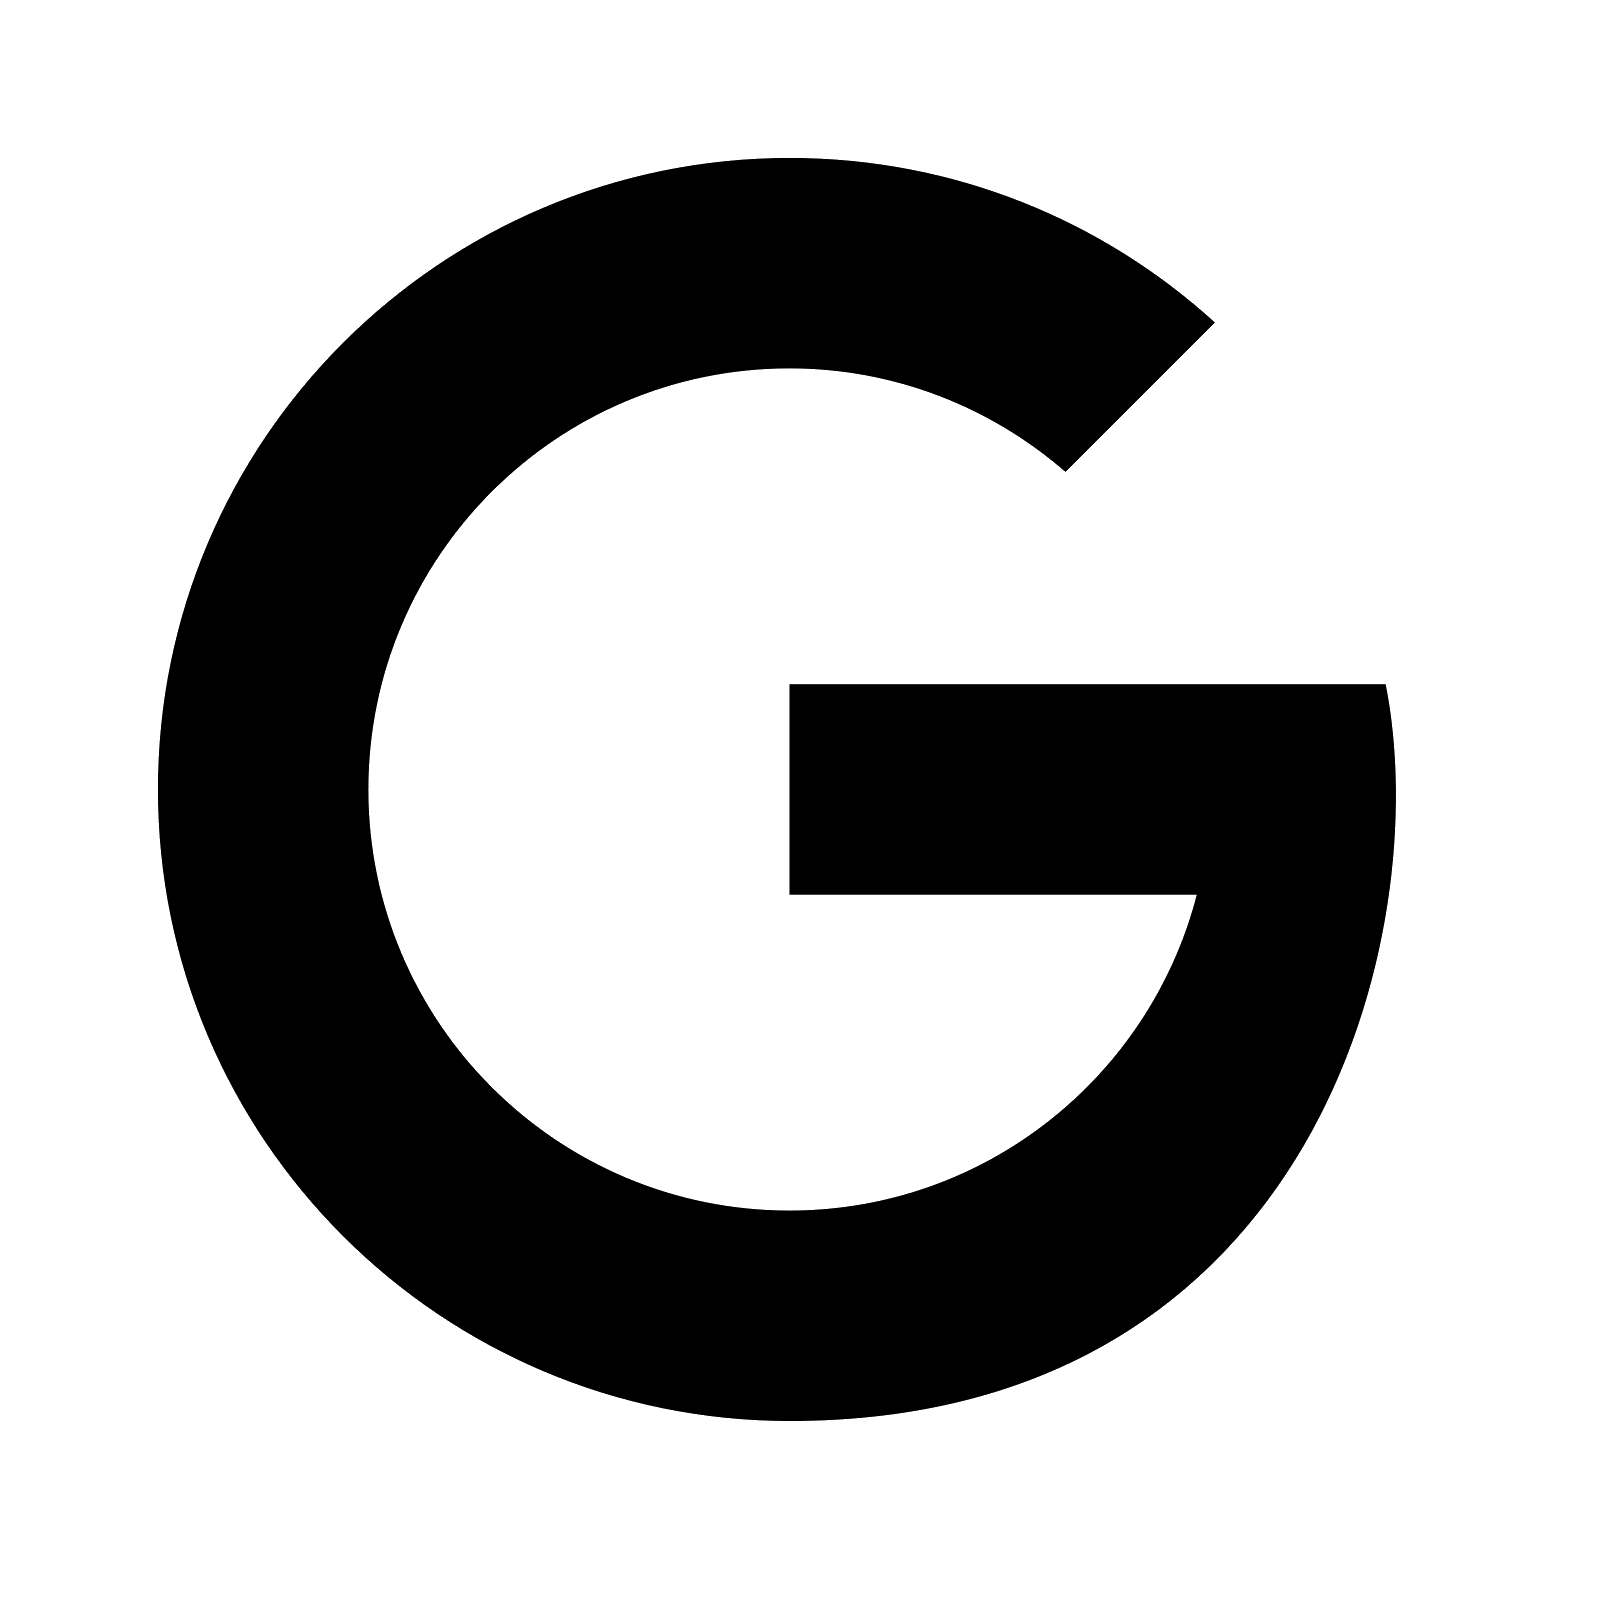 Google logo white png. Pay per click transprent